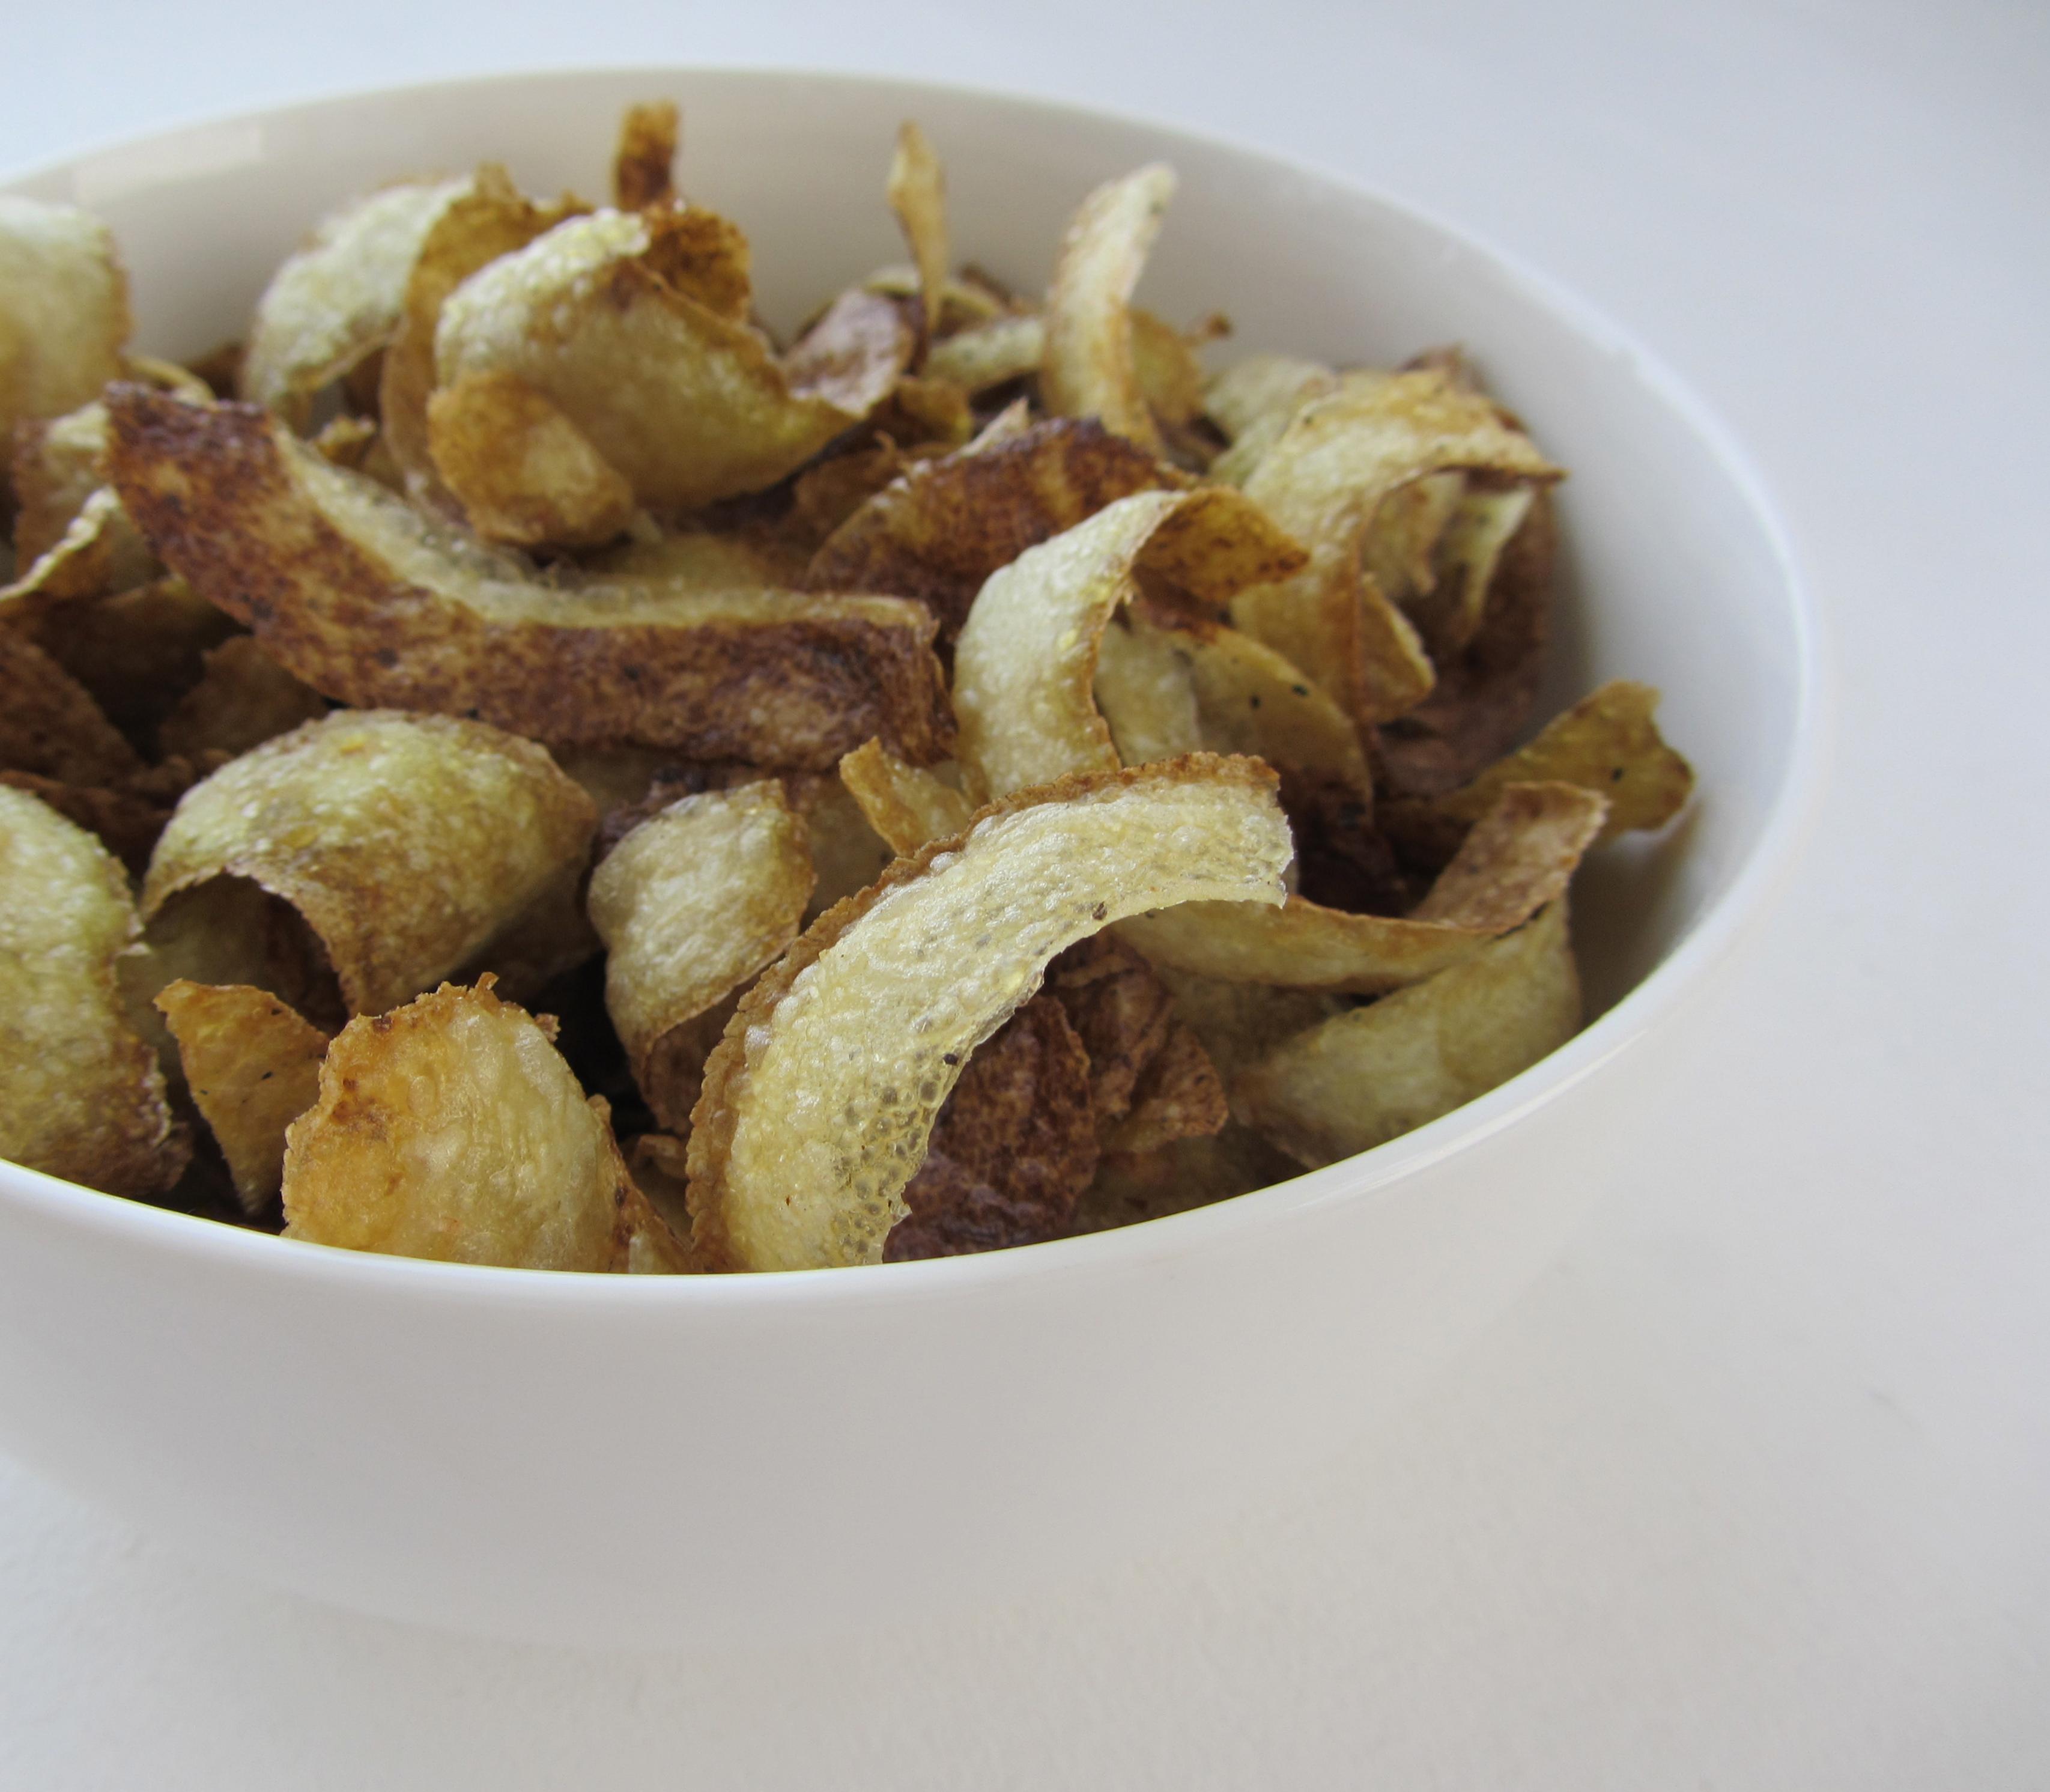 How to make potato skin fries